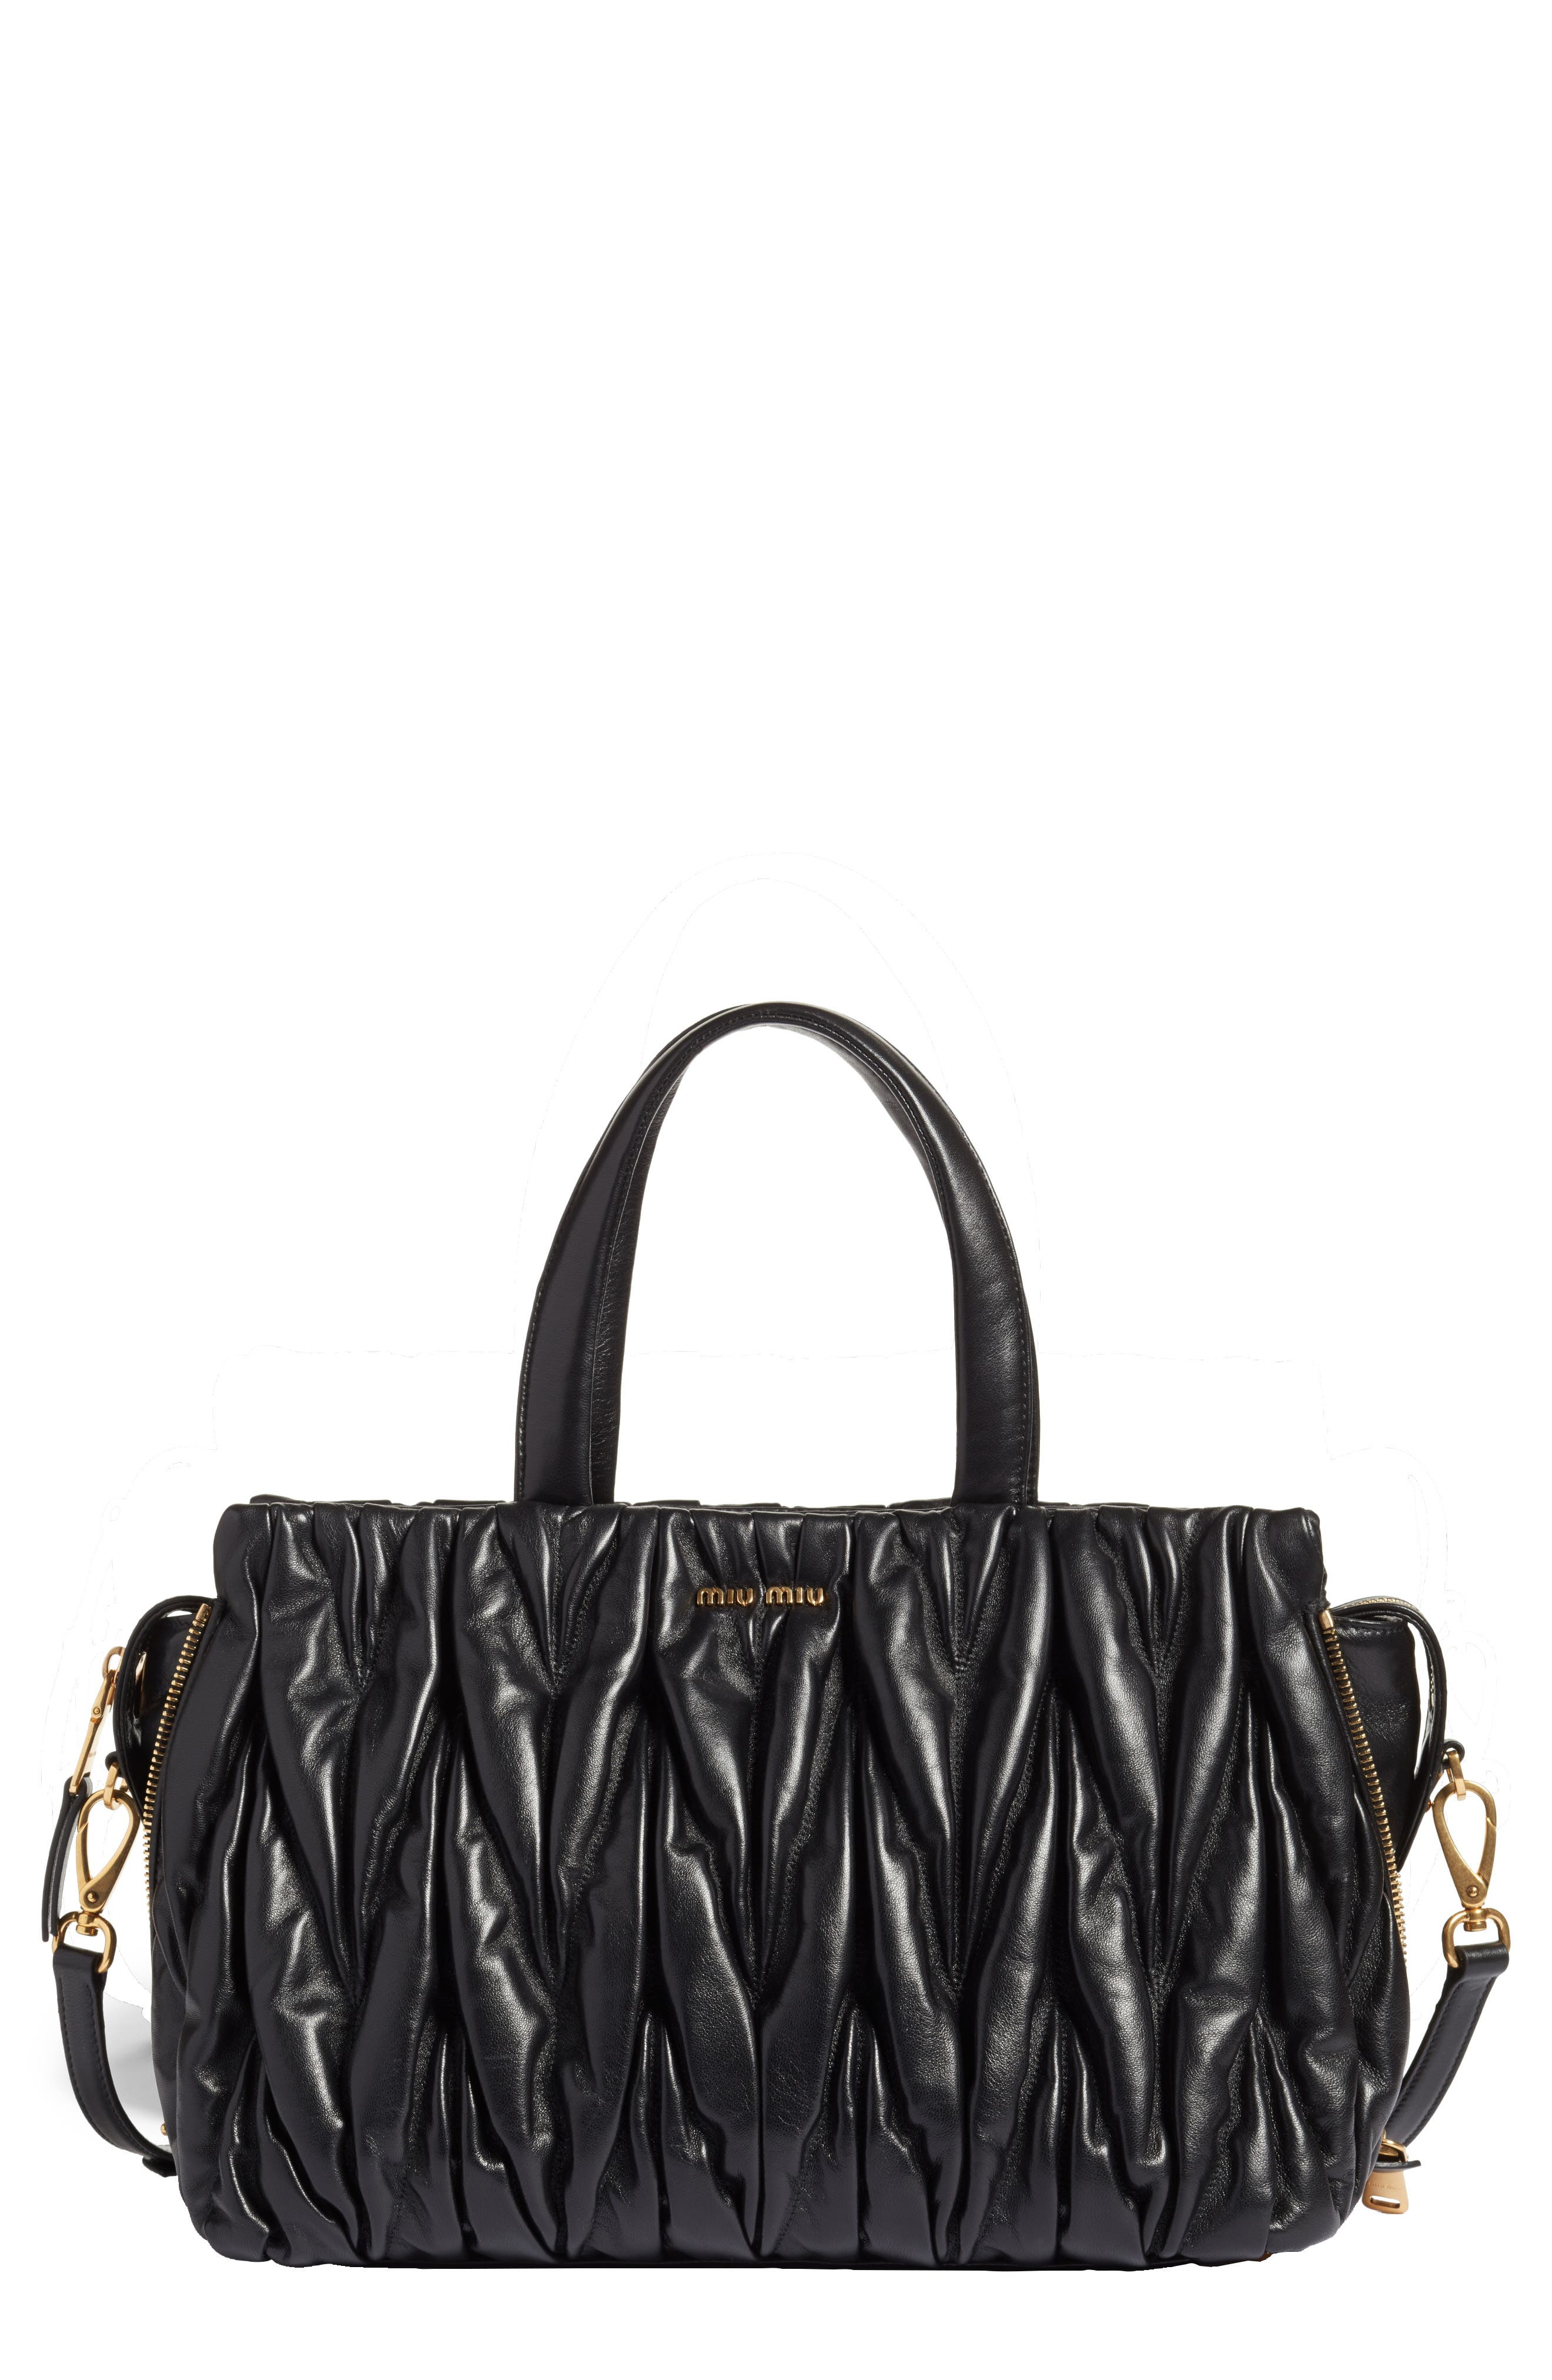 Miu Miu Matelassé Leather Top Handle Satchel